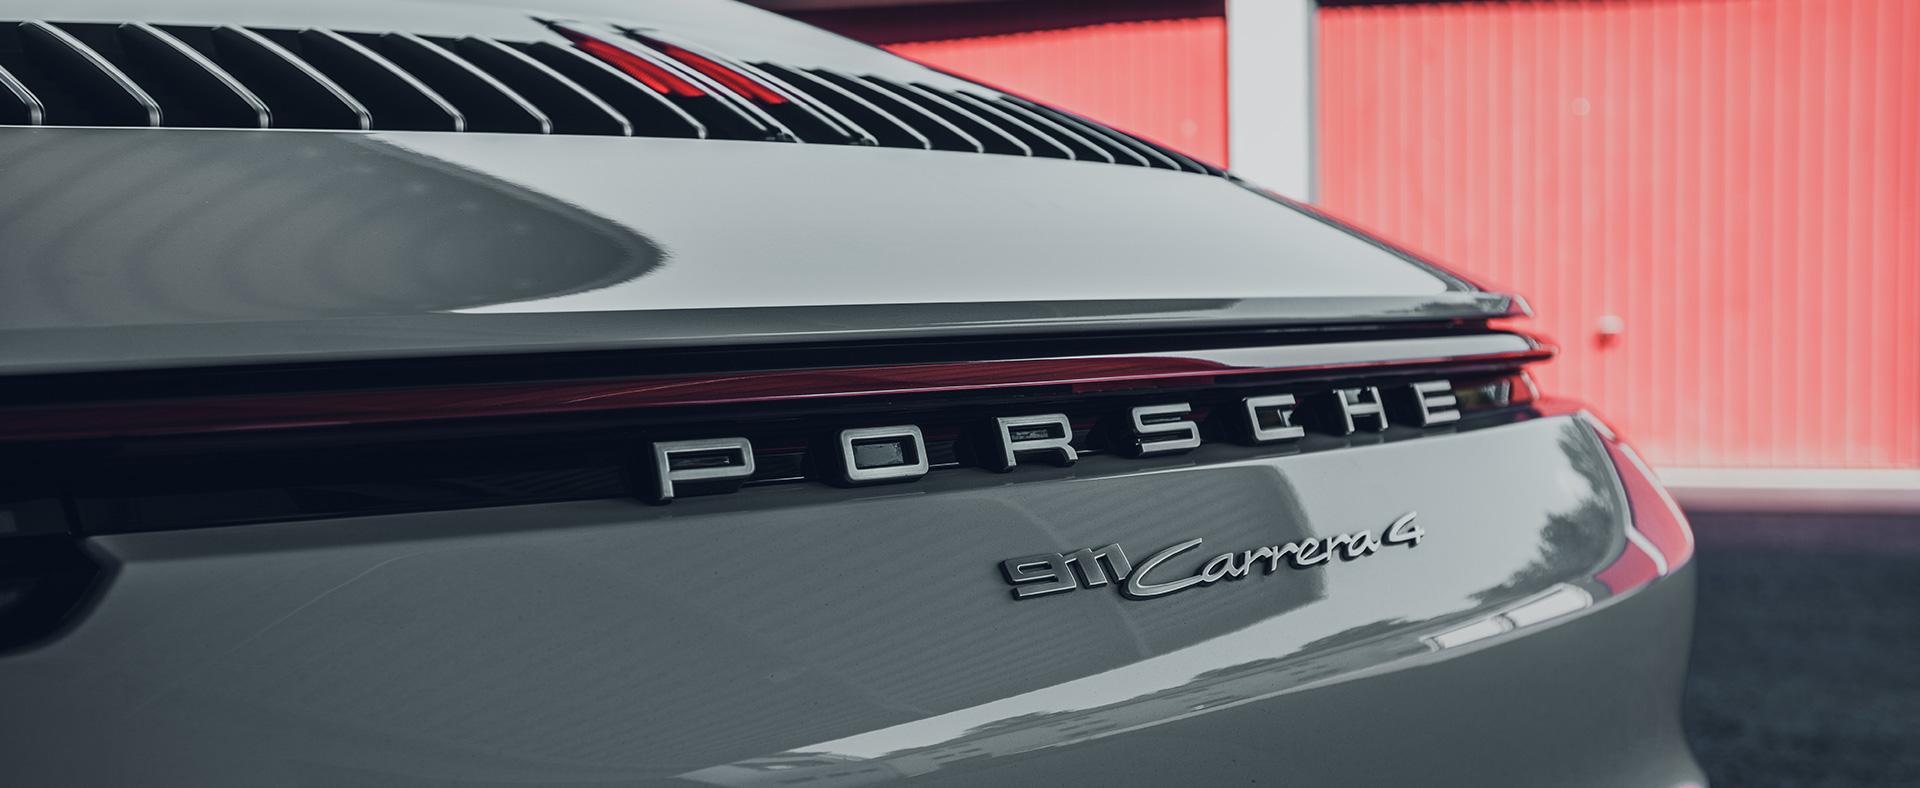 Toyota Supra 2.0 Turbo tuned – A valid alternative to the 3.0 version?